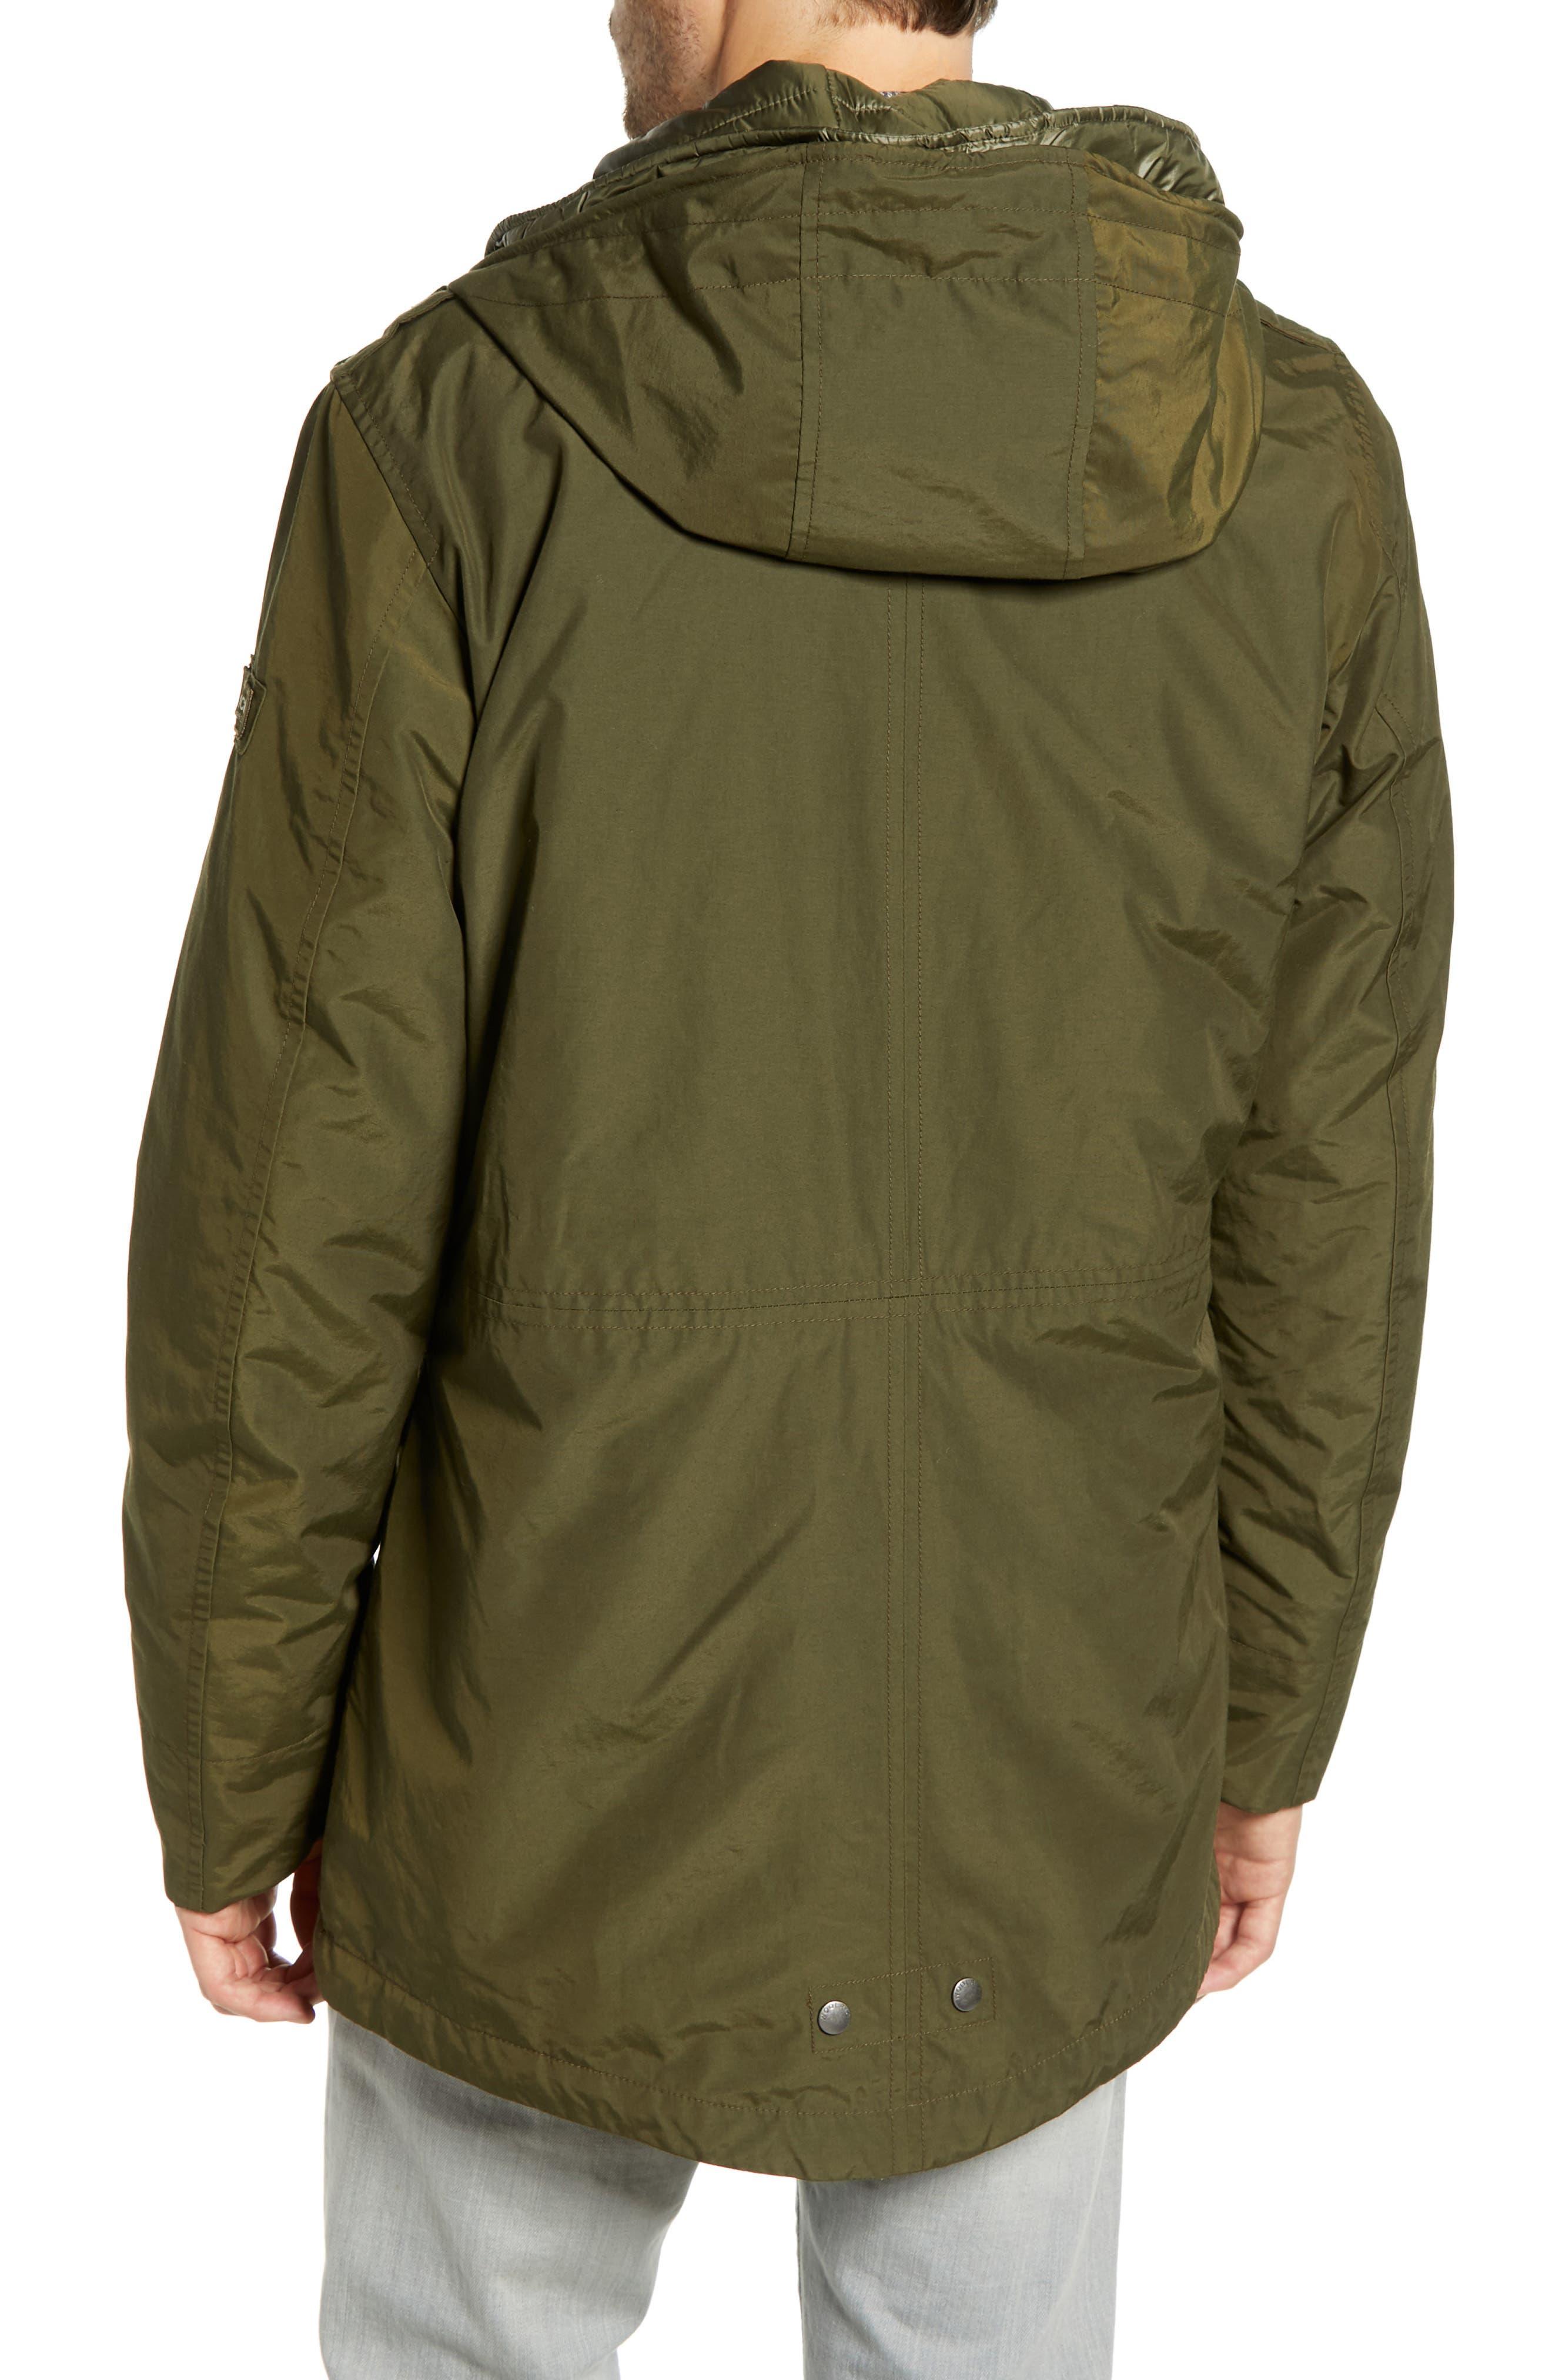 John Rich 'Long Military Eskimo' 3-in-1 Hooded Jacket,                             Alternate thumbnail 3, color,                             FLINT OLIVE